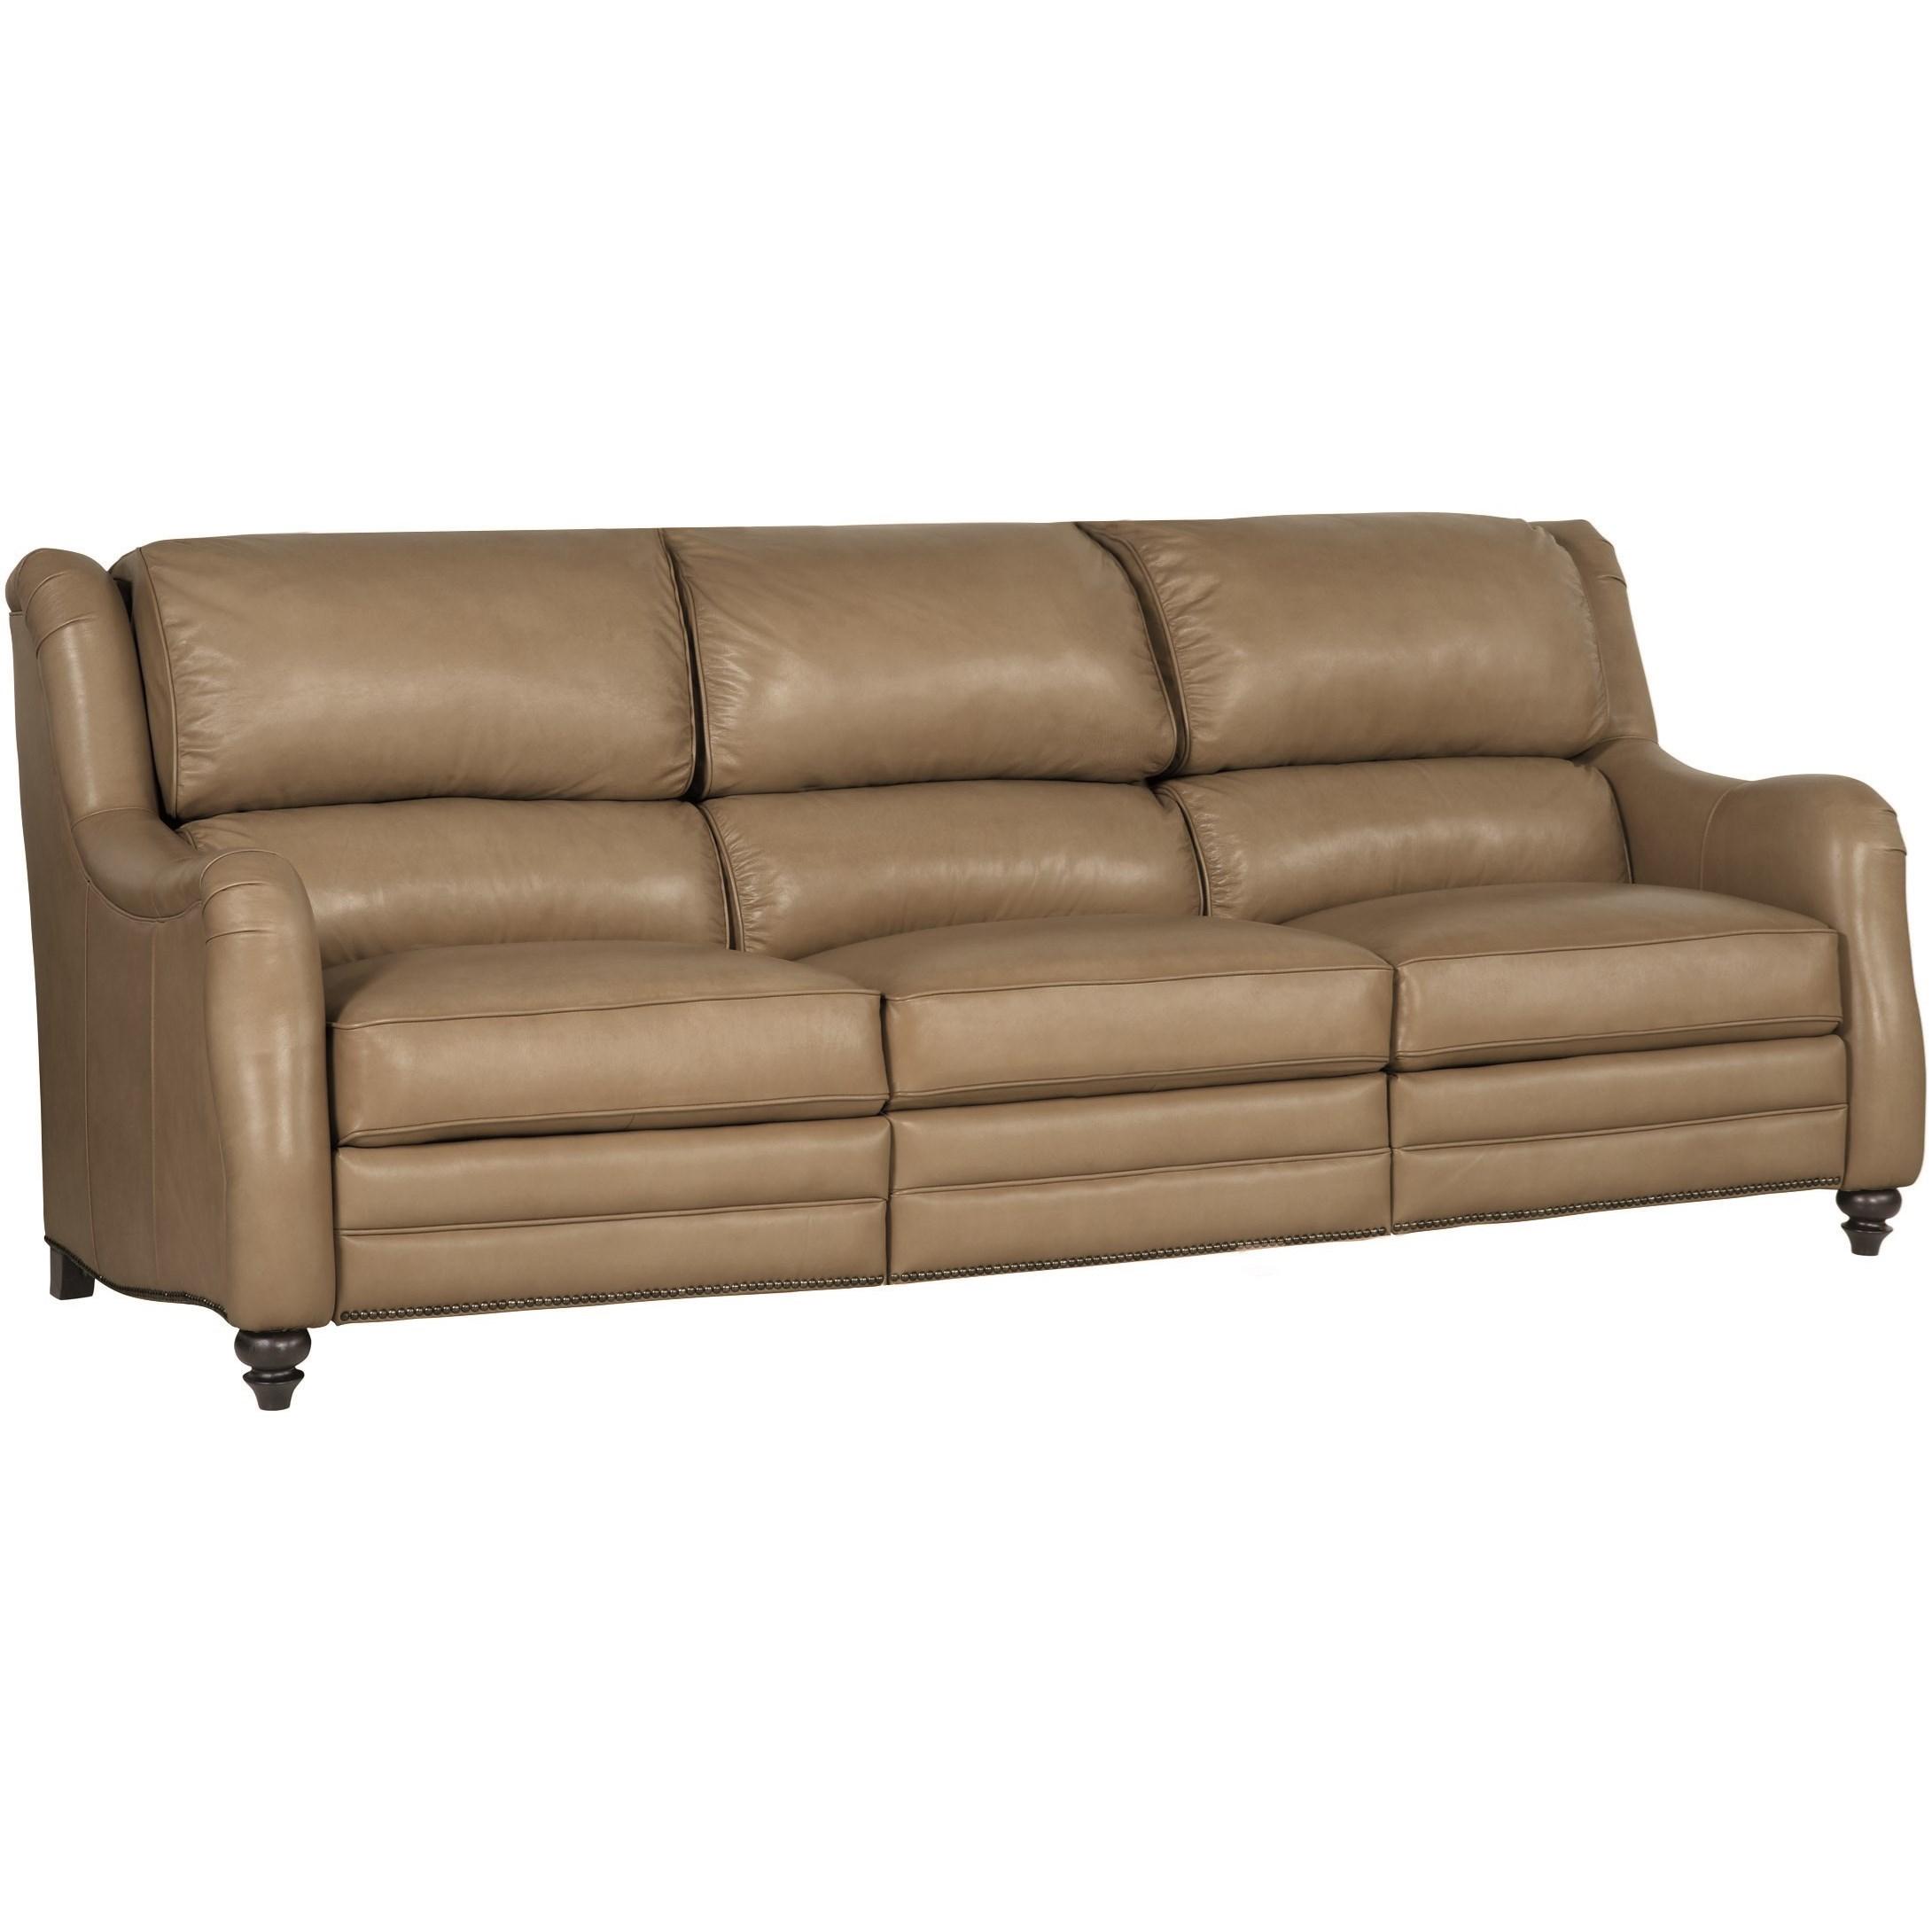 Lawson Reclining Power Motion Sofa By Bernhardt